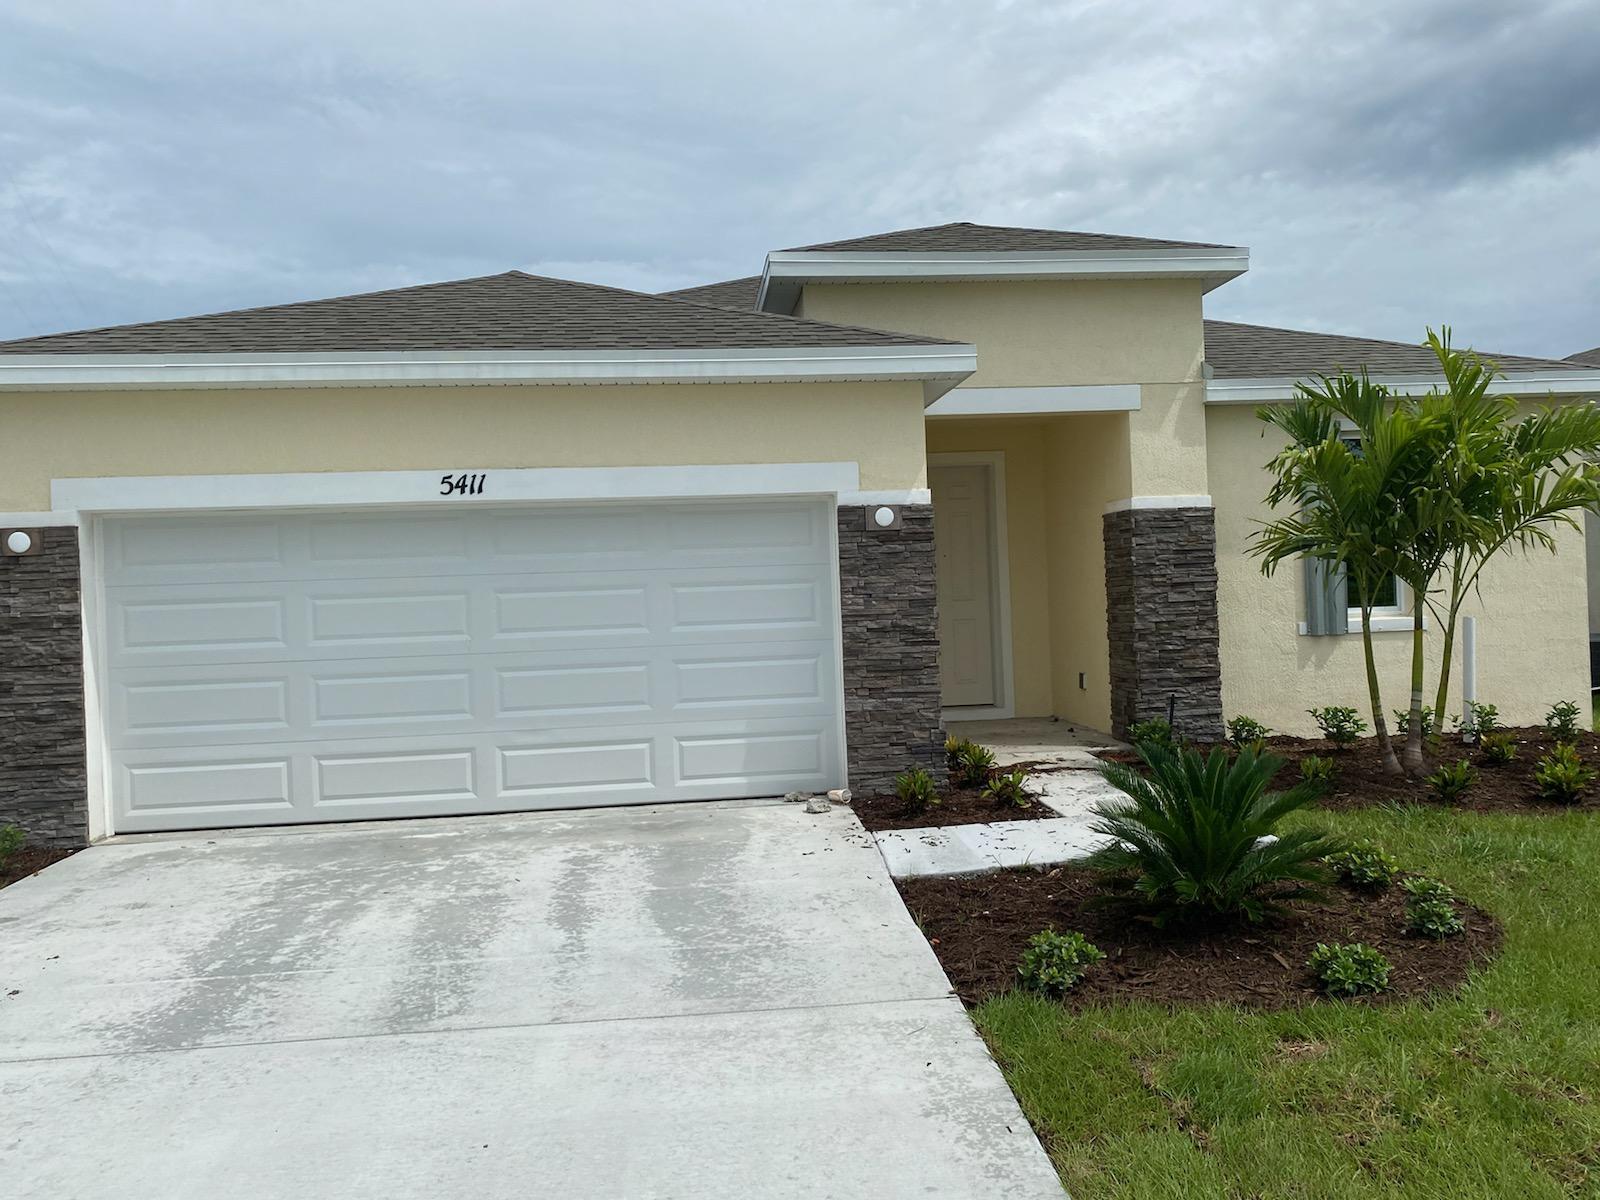 Photo of 5411 Entertainment Way, Fort Pierce, FL 34947